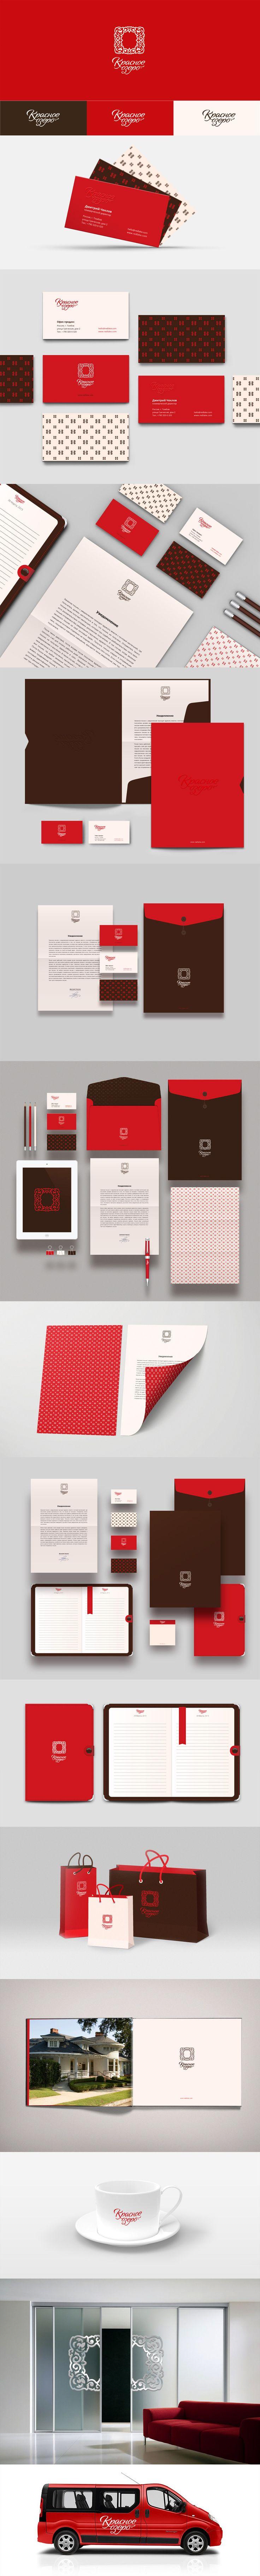 RedLake #identity #packaging #branding #marketing PD